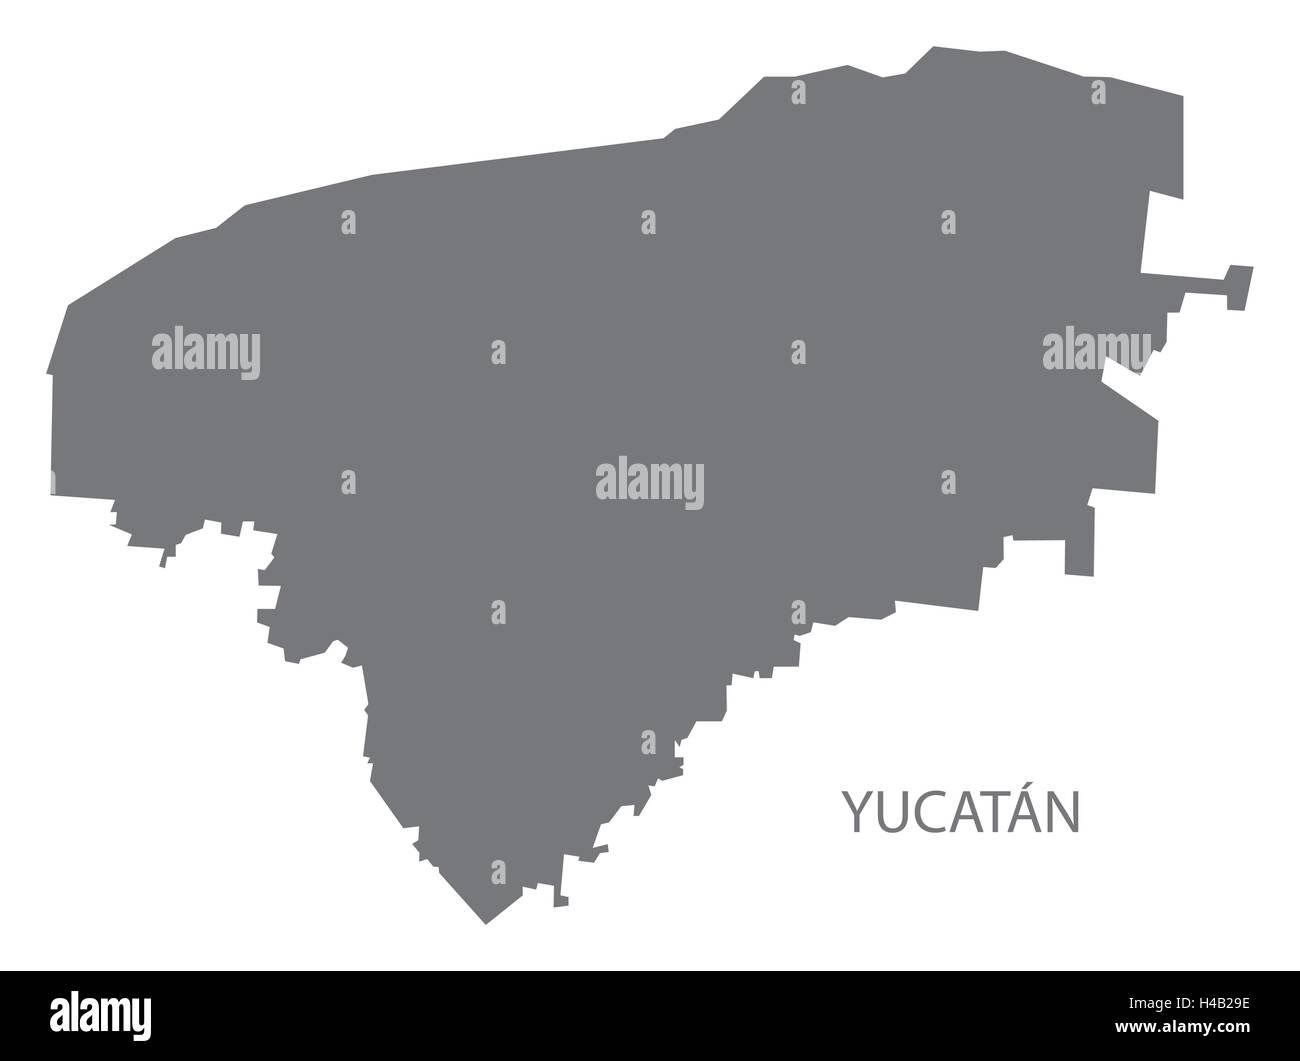 Yucatan Mexico Map grey - Stock Image